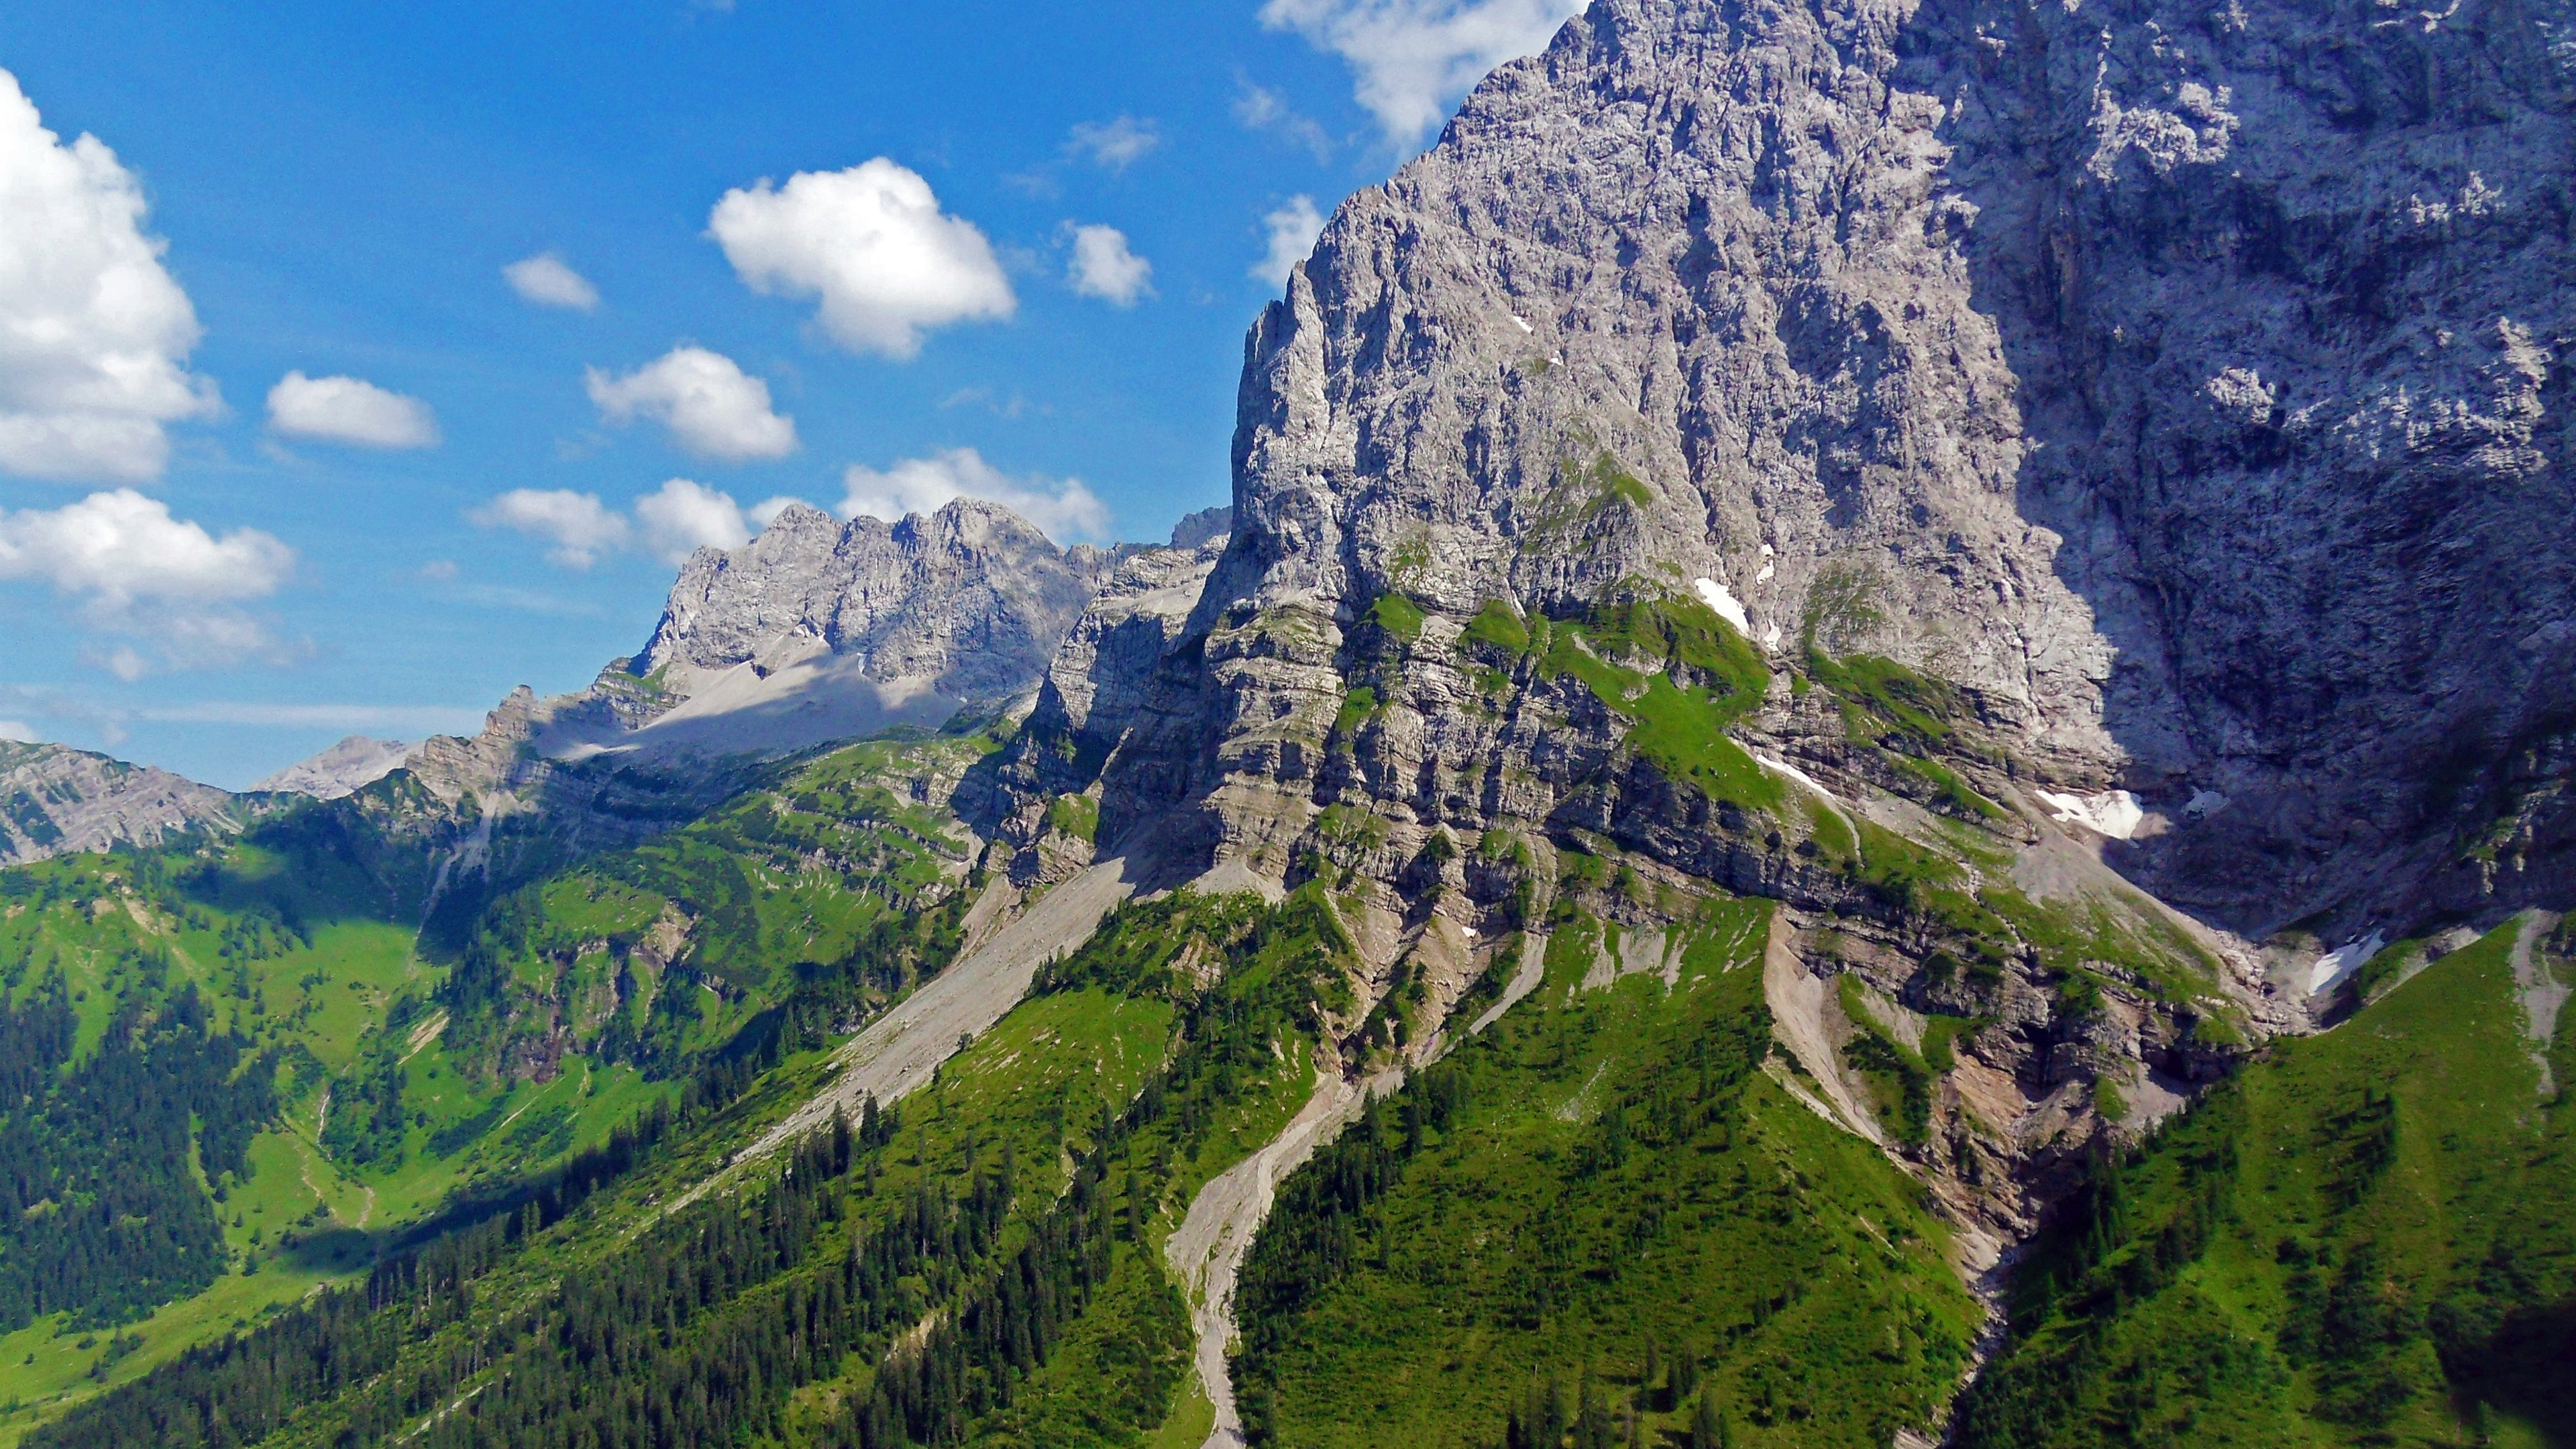 Free Images 4k Wallpaper Beach Calm Cliff Clouds Hd: オーストリア、アルプス山、木々、崖、雲 壁紙